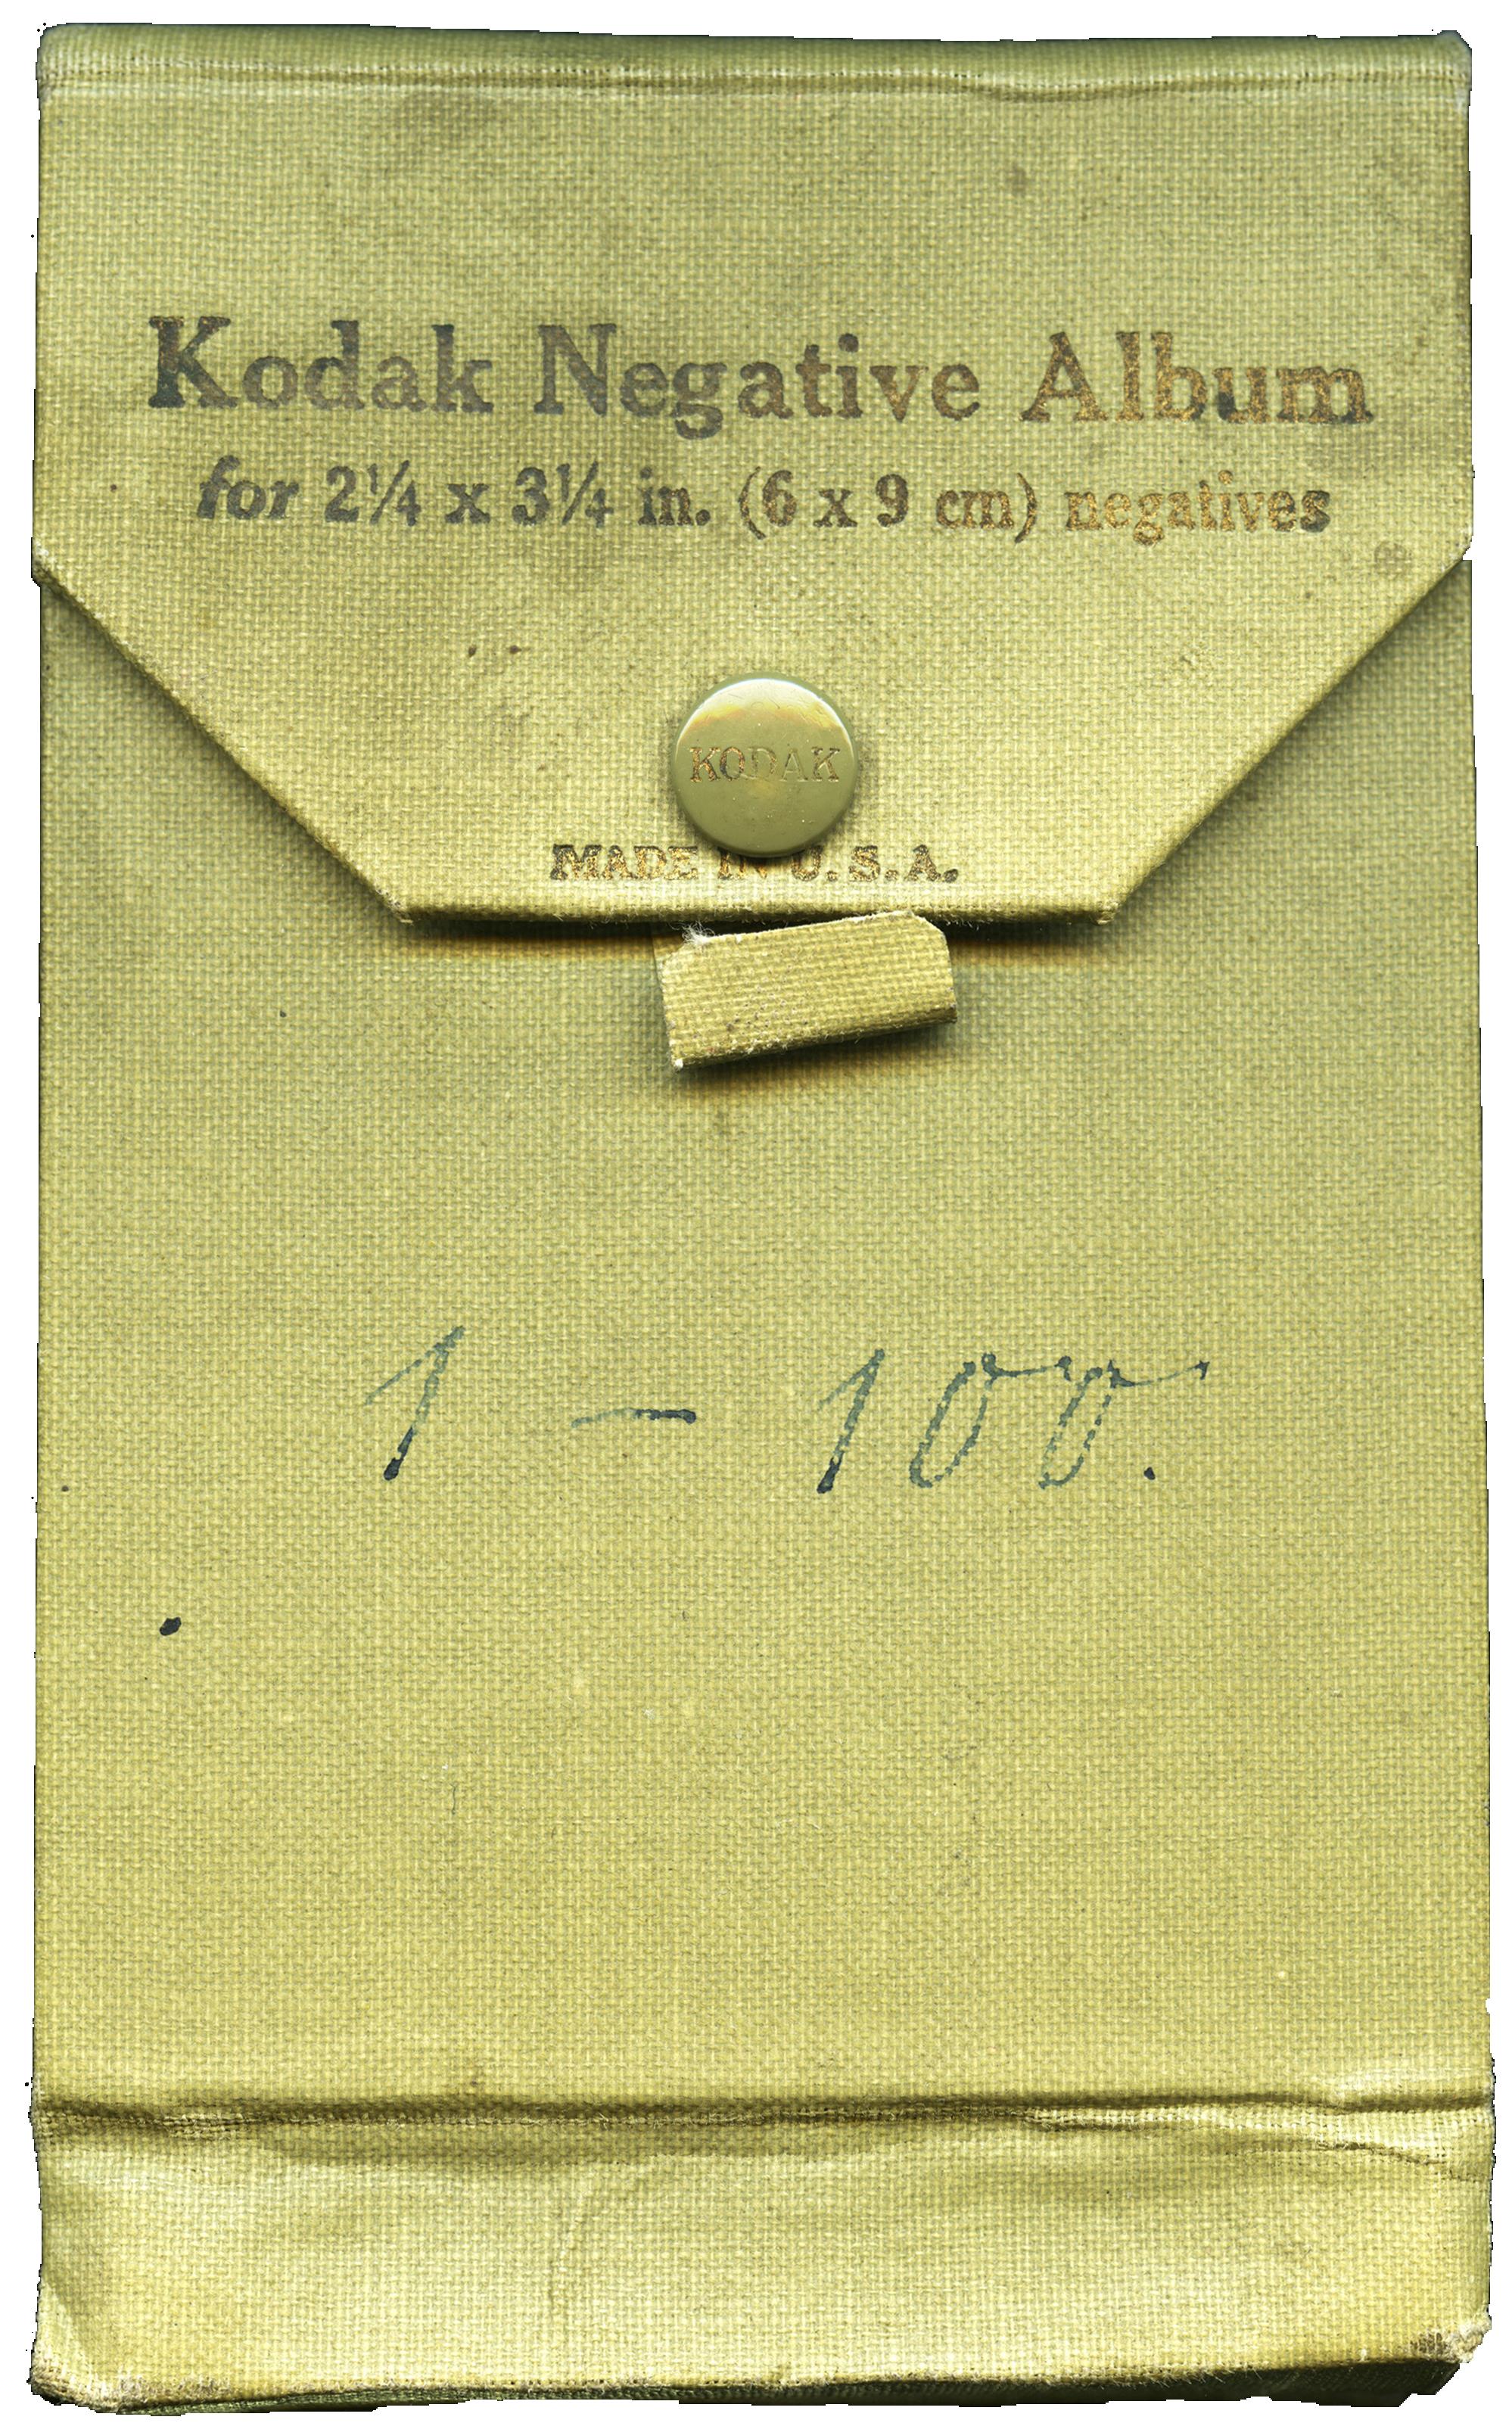 0.2.01b - Kodak-Platten dunkel.png